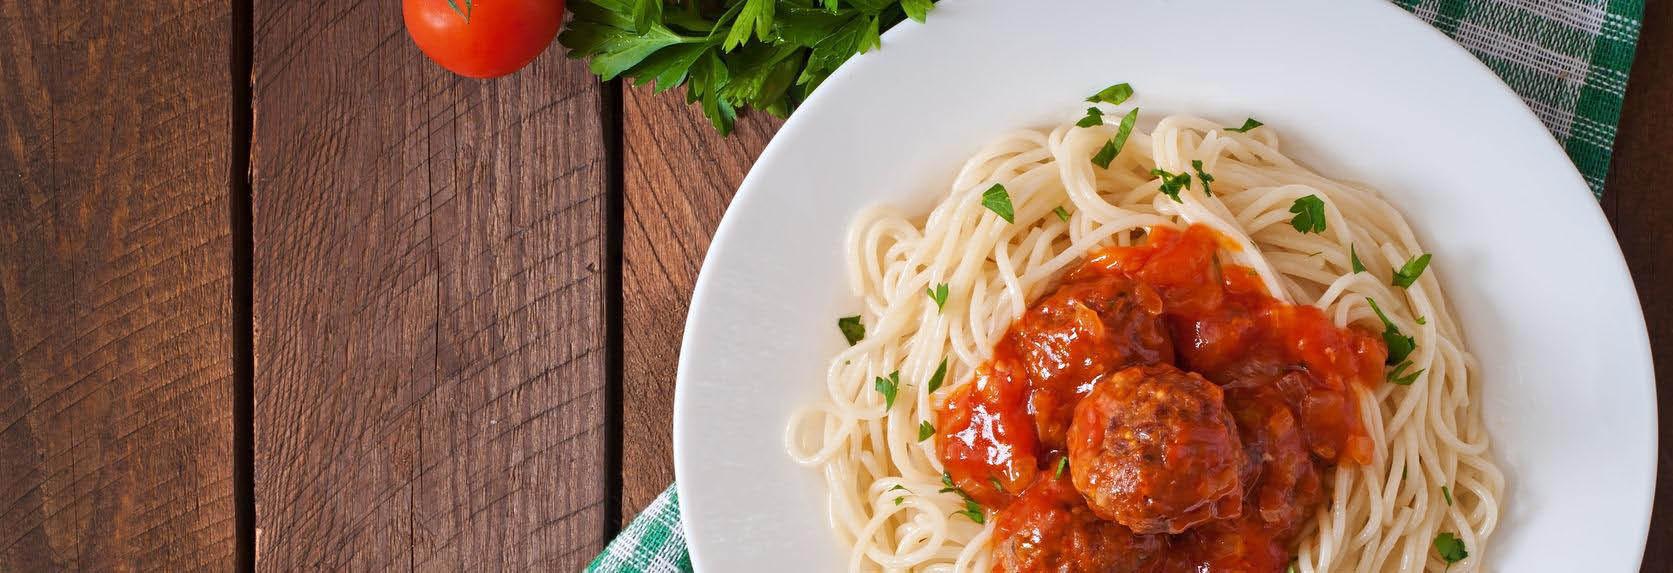 Linda's Italian Cuisine banner